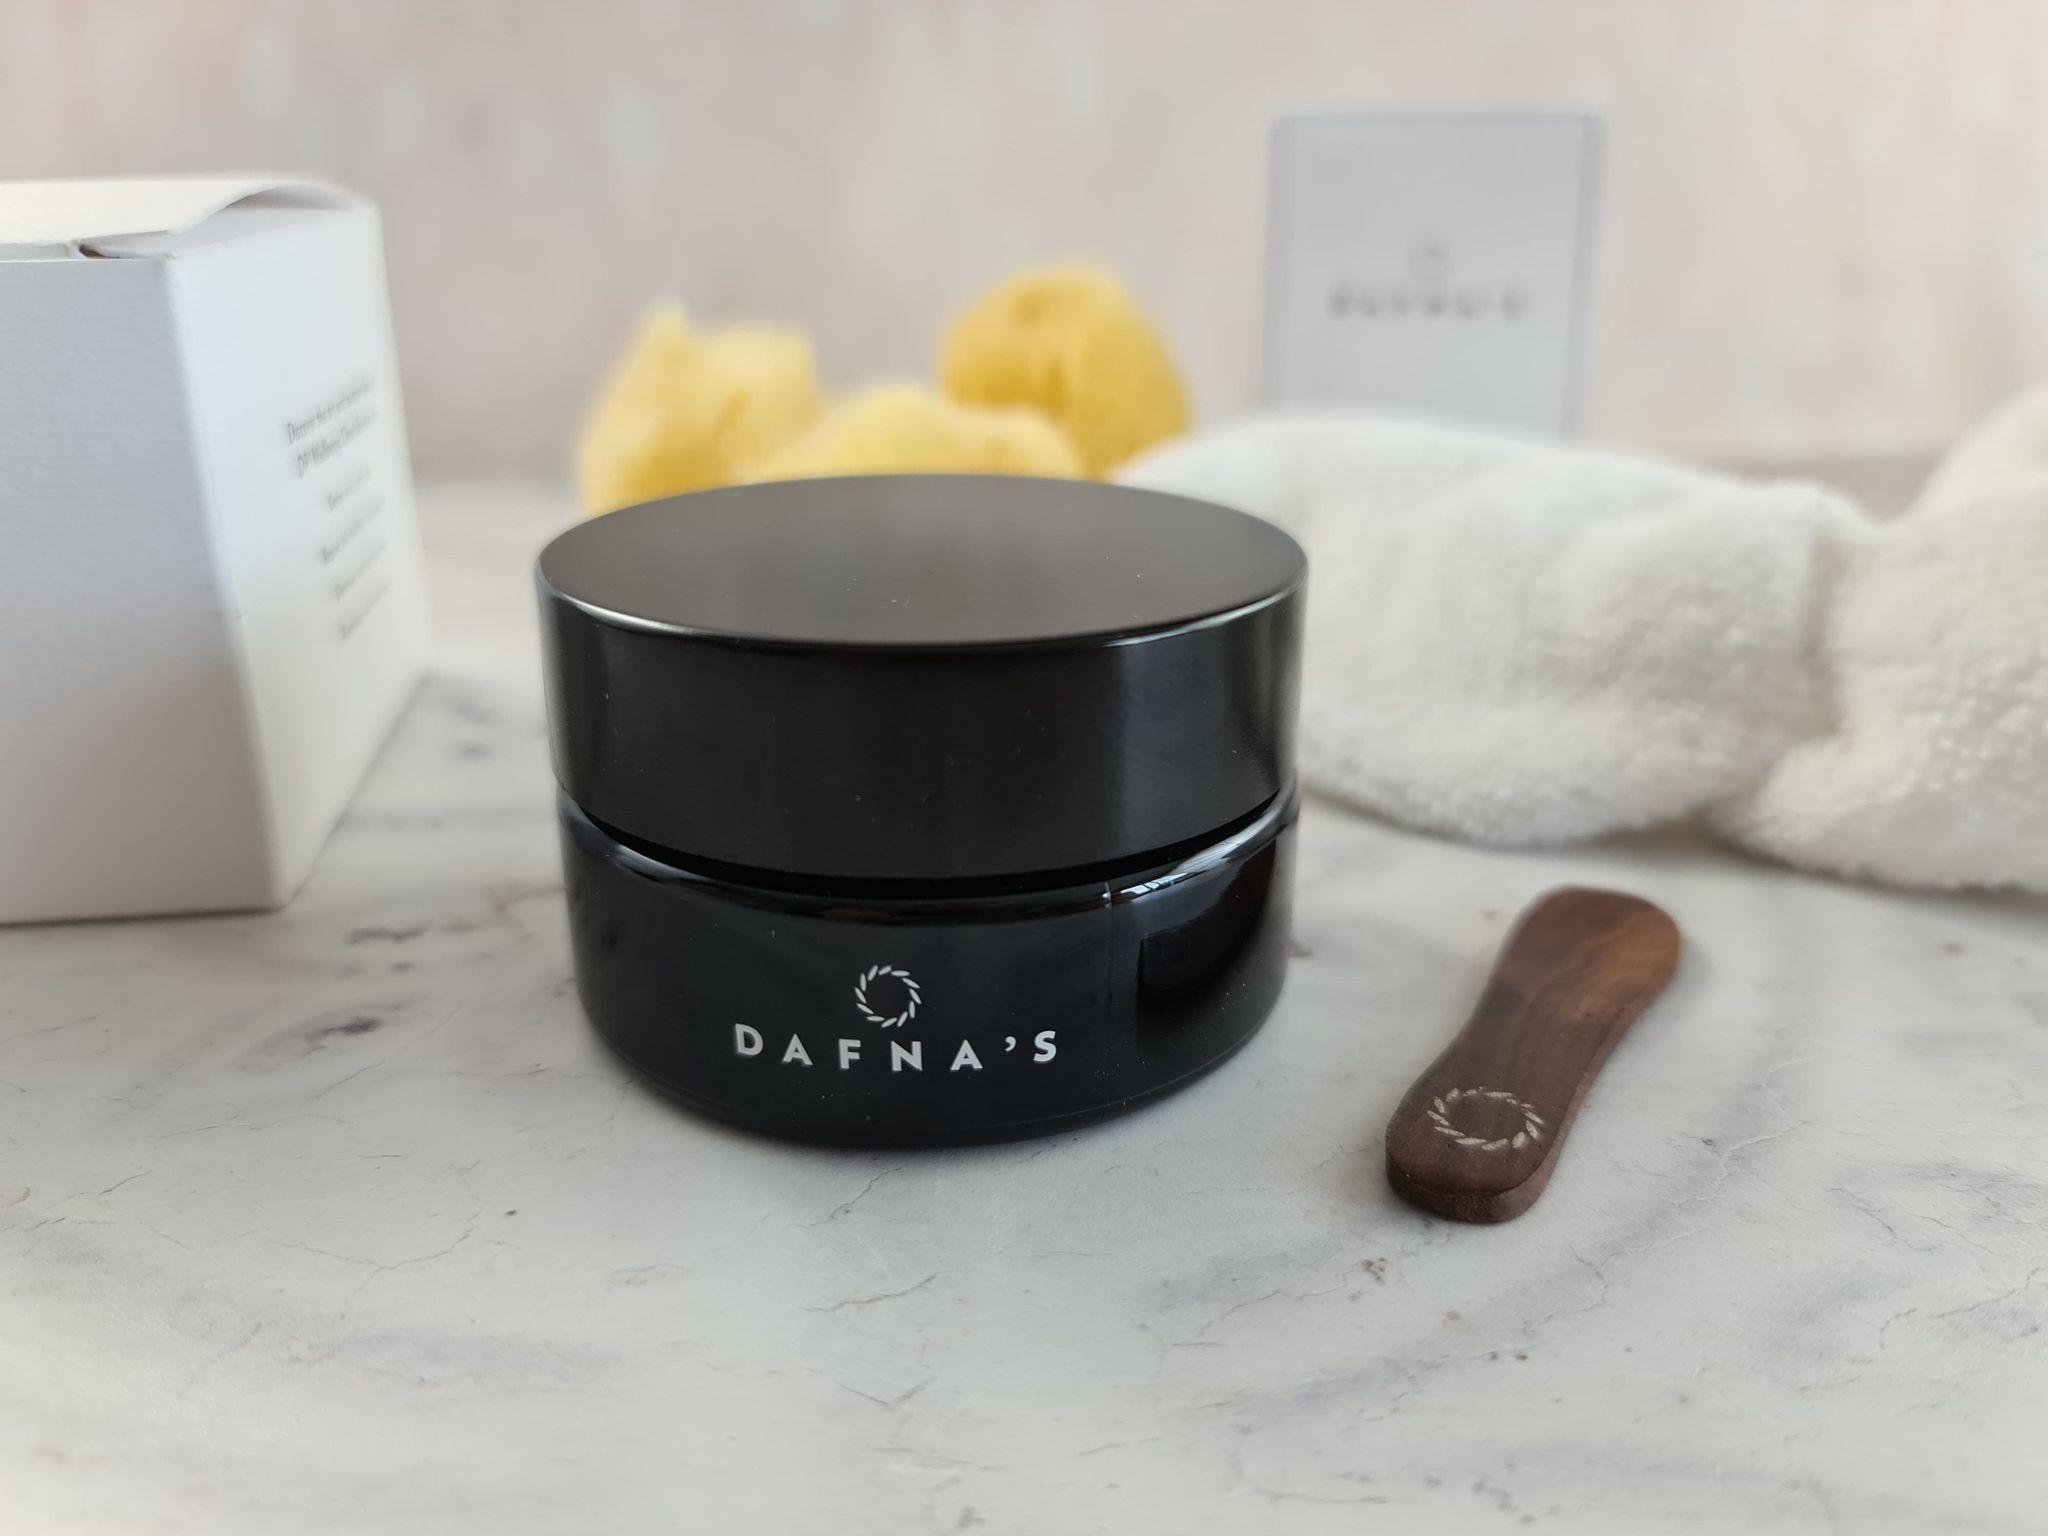 Dafna's Skincare Detoxify Mask & Exfoliation review